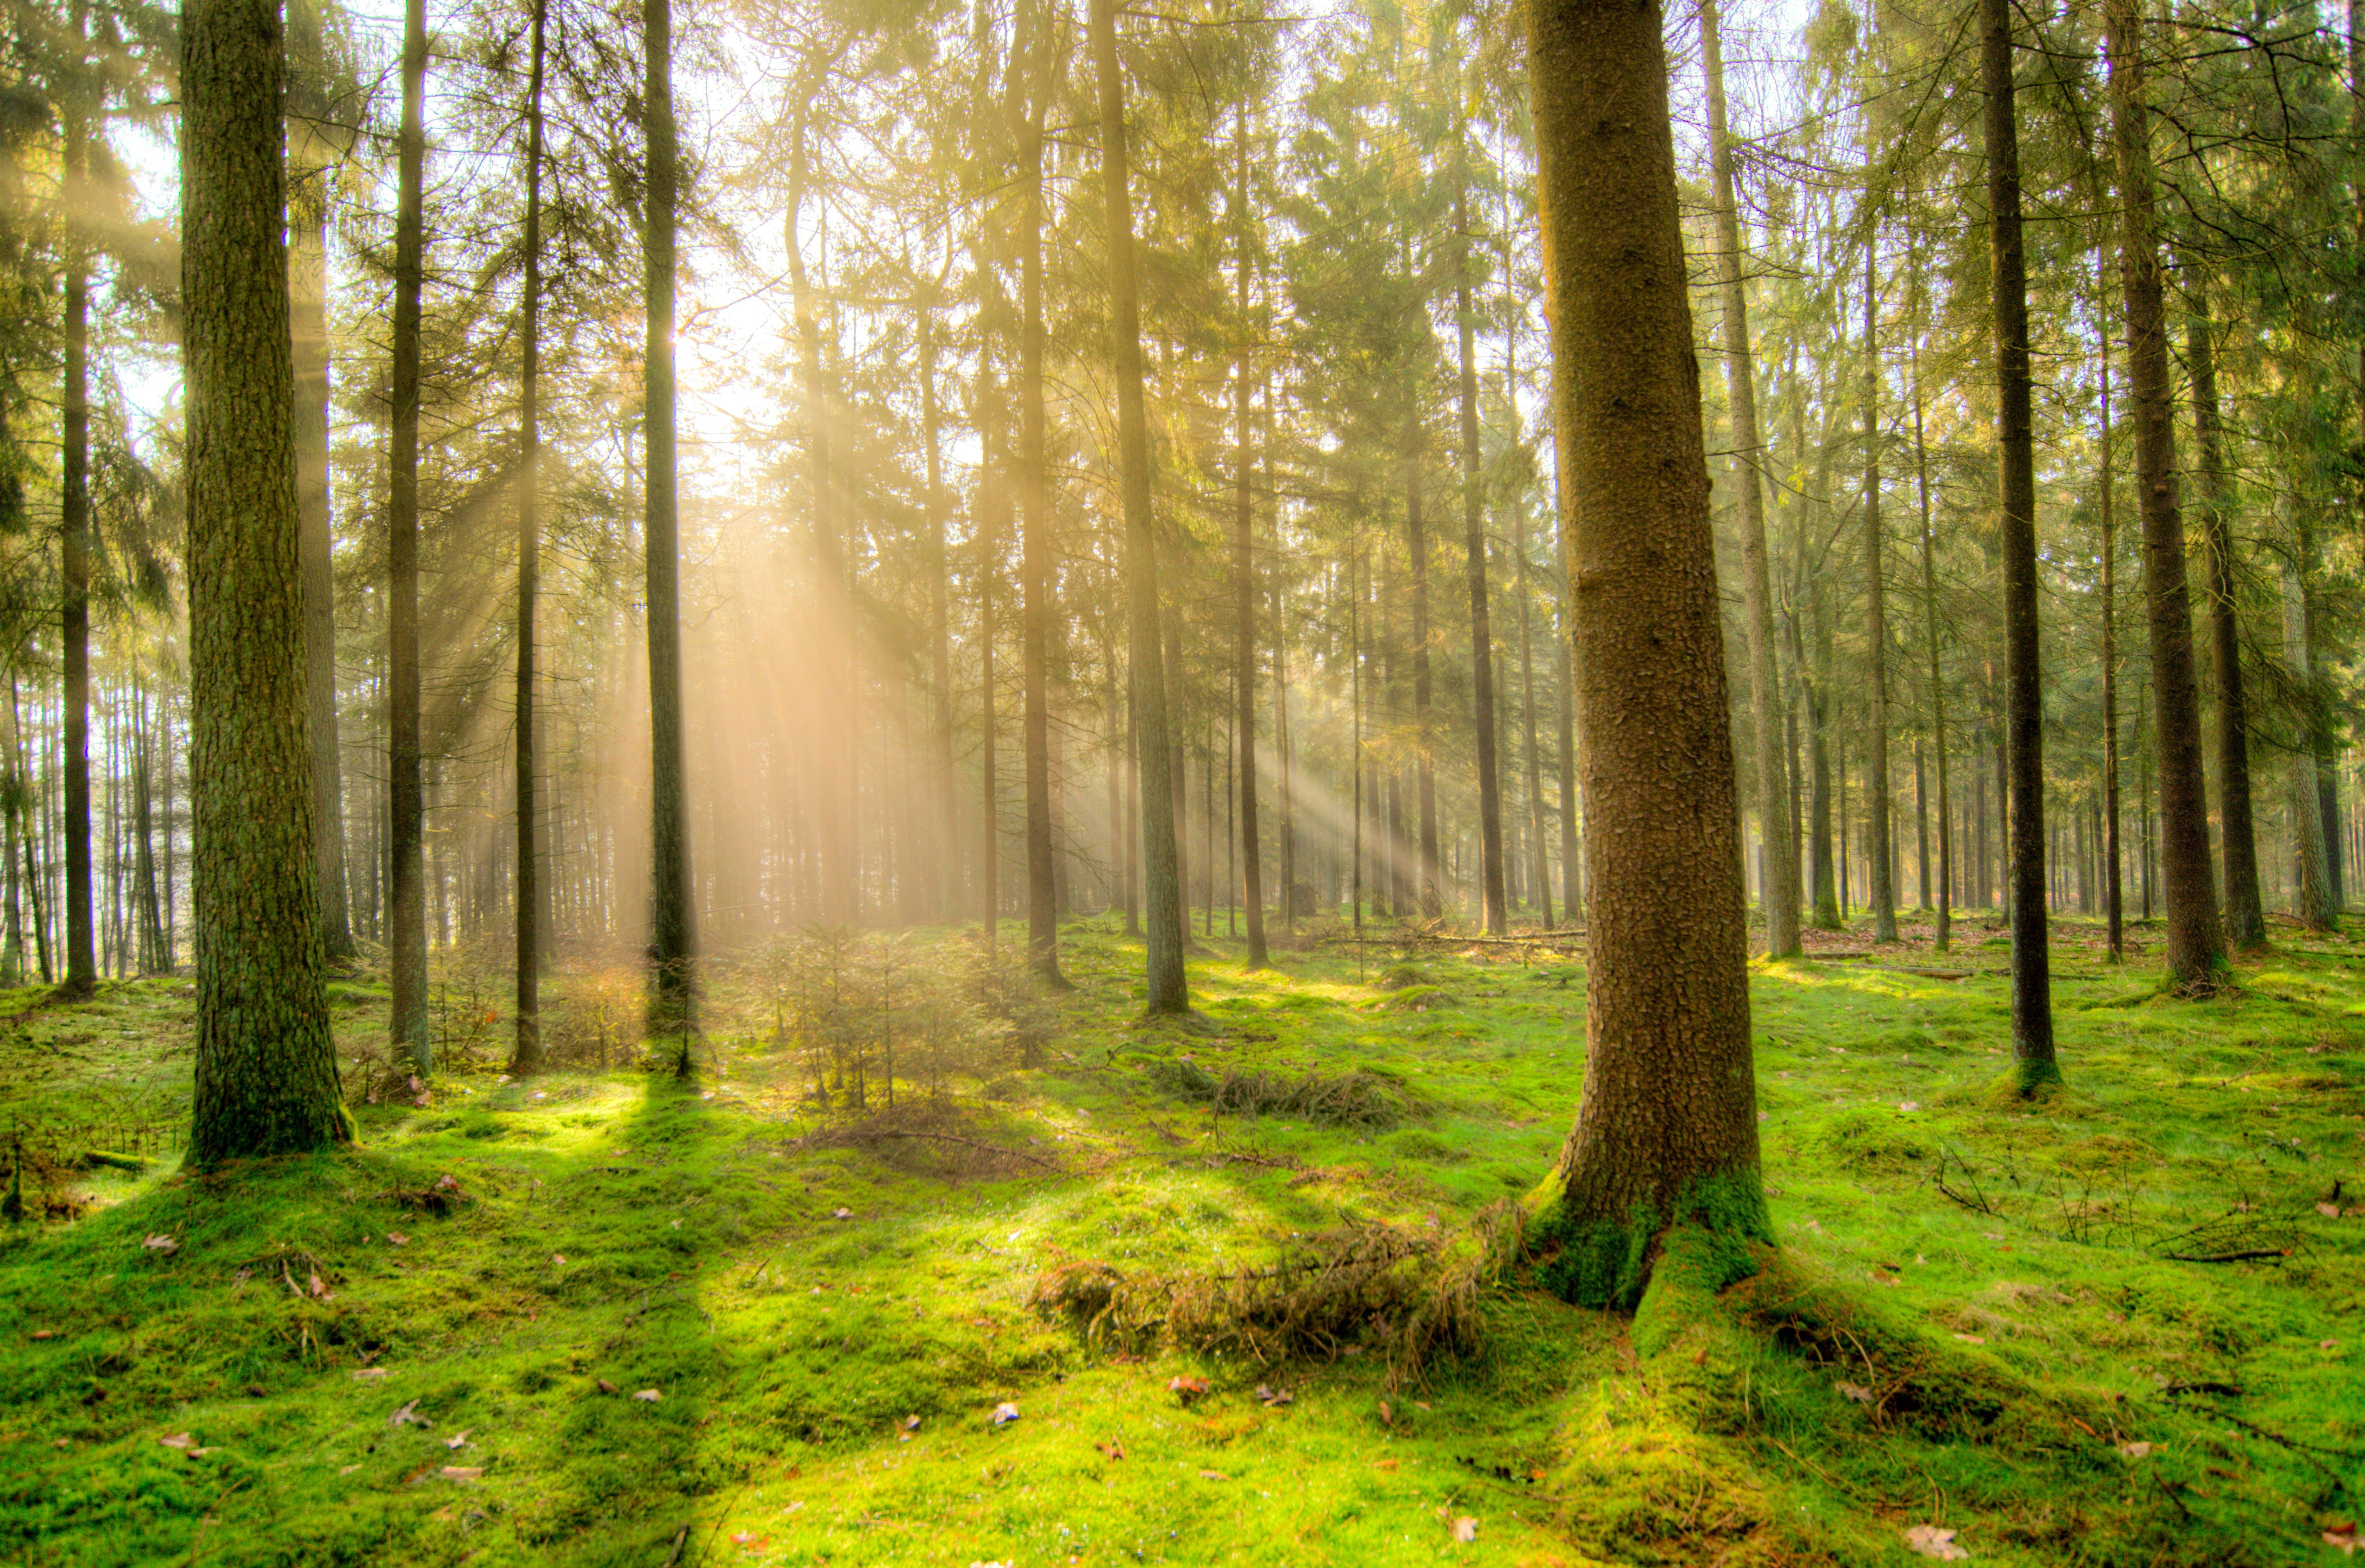 Gratis stockfoto met Bos, bossen, daglicht, decor